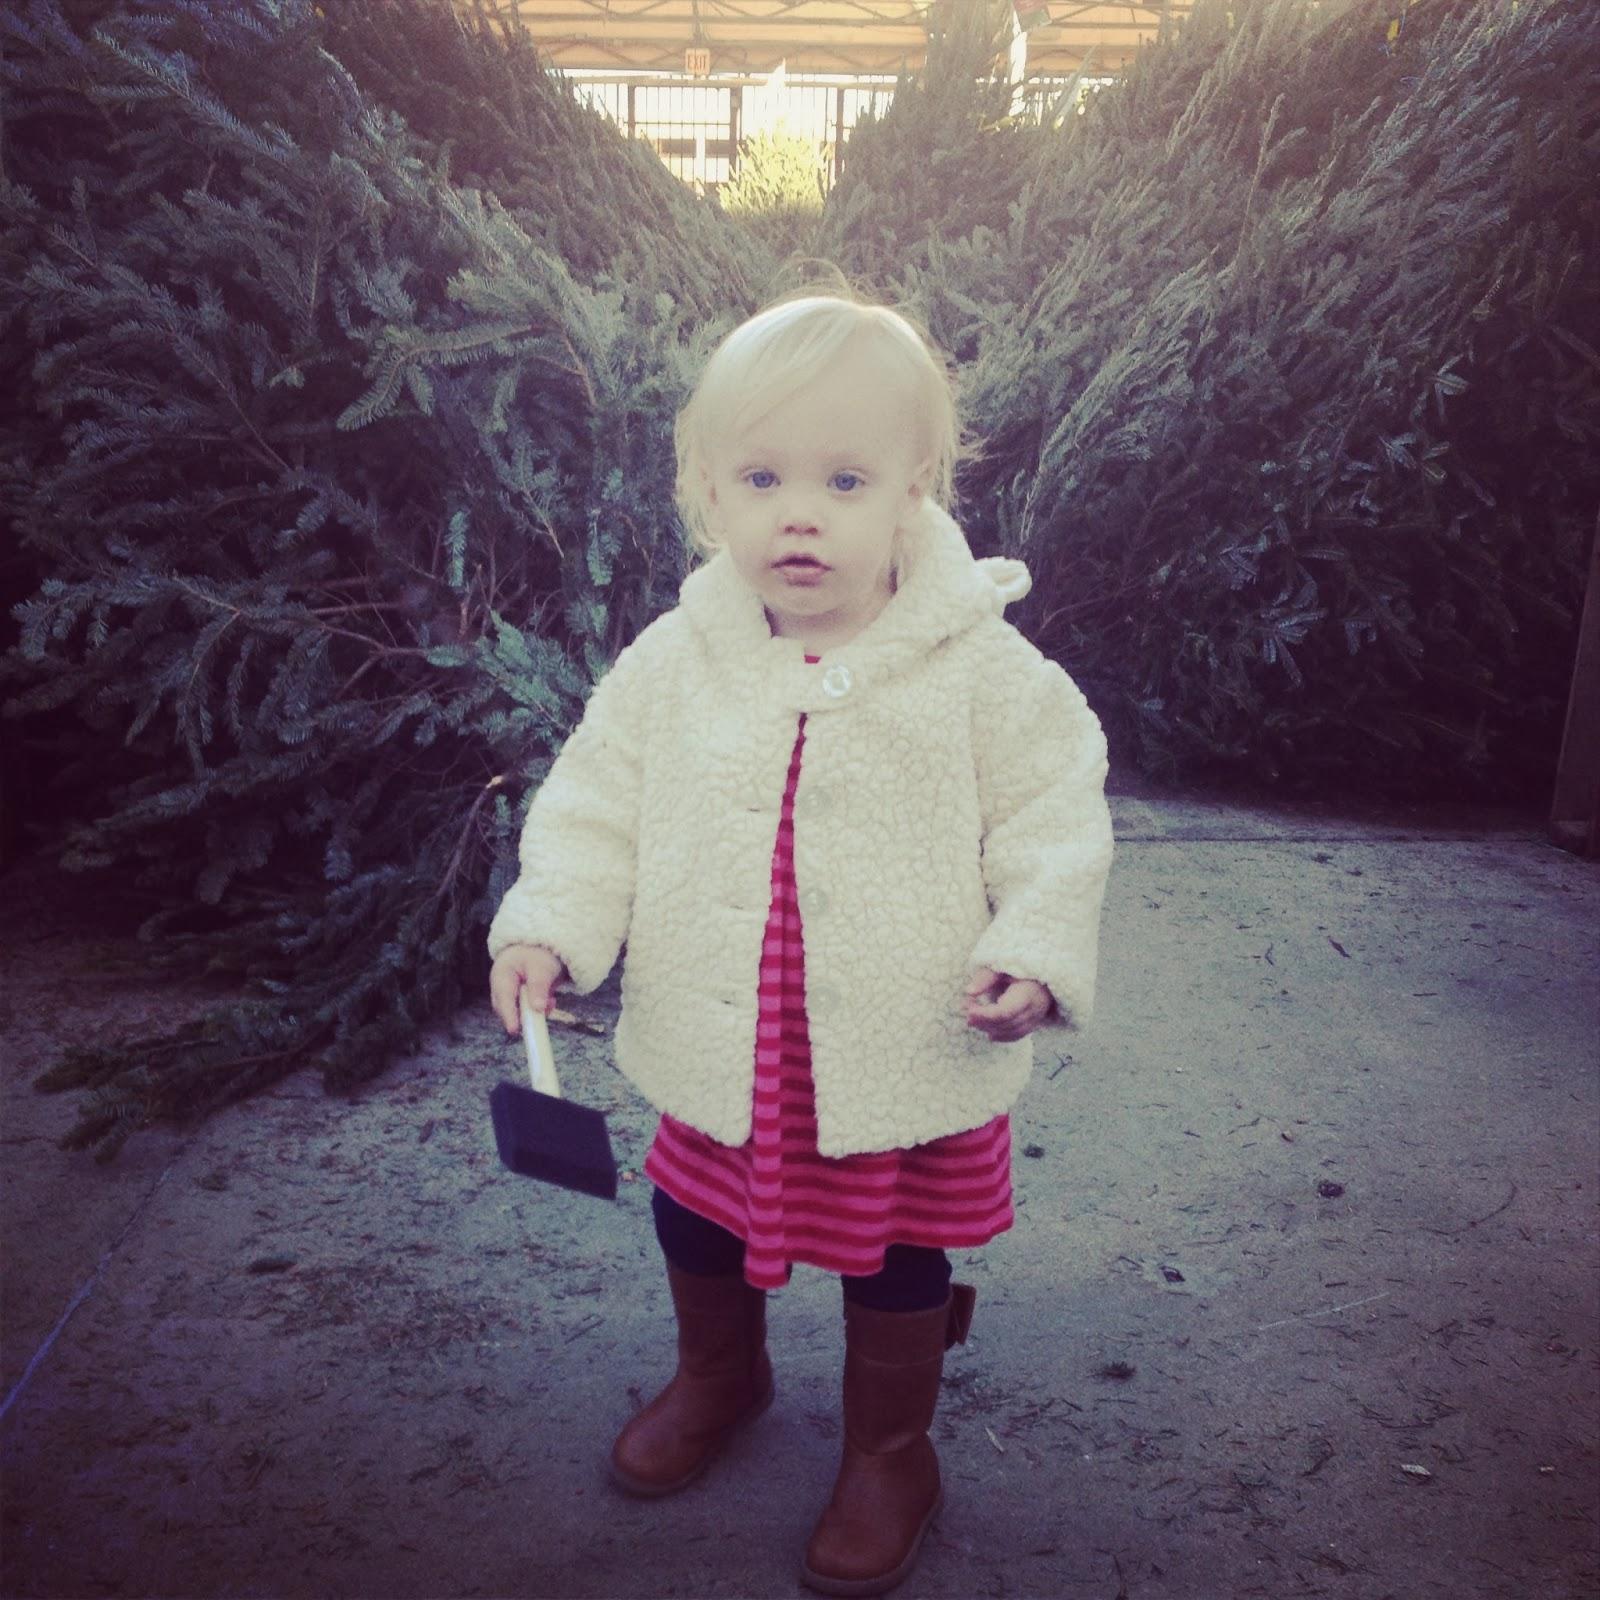 Home Depot Real Christmas Tree Prices: Lil' Bit Henson: Oh, Christmas Tree